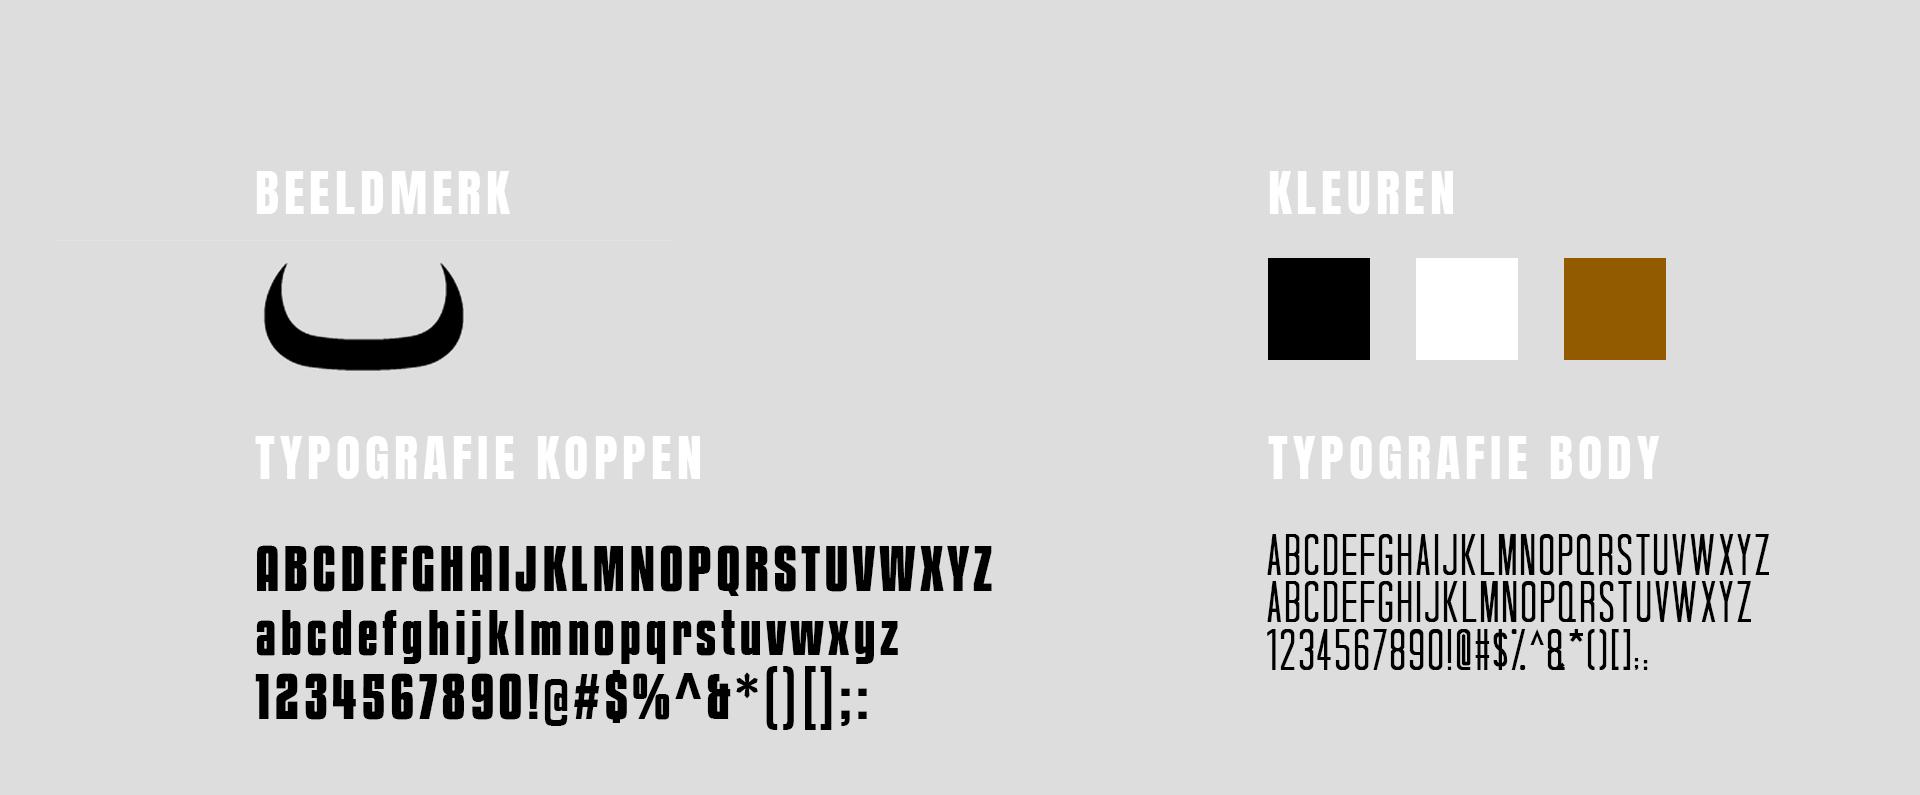 Slagerij Pieter Kling | Brandguide